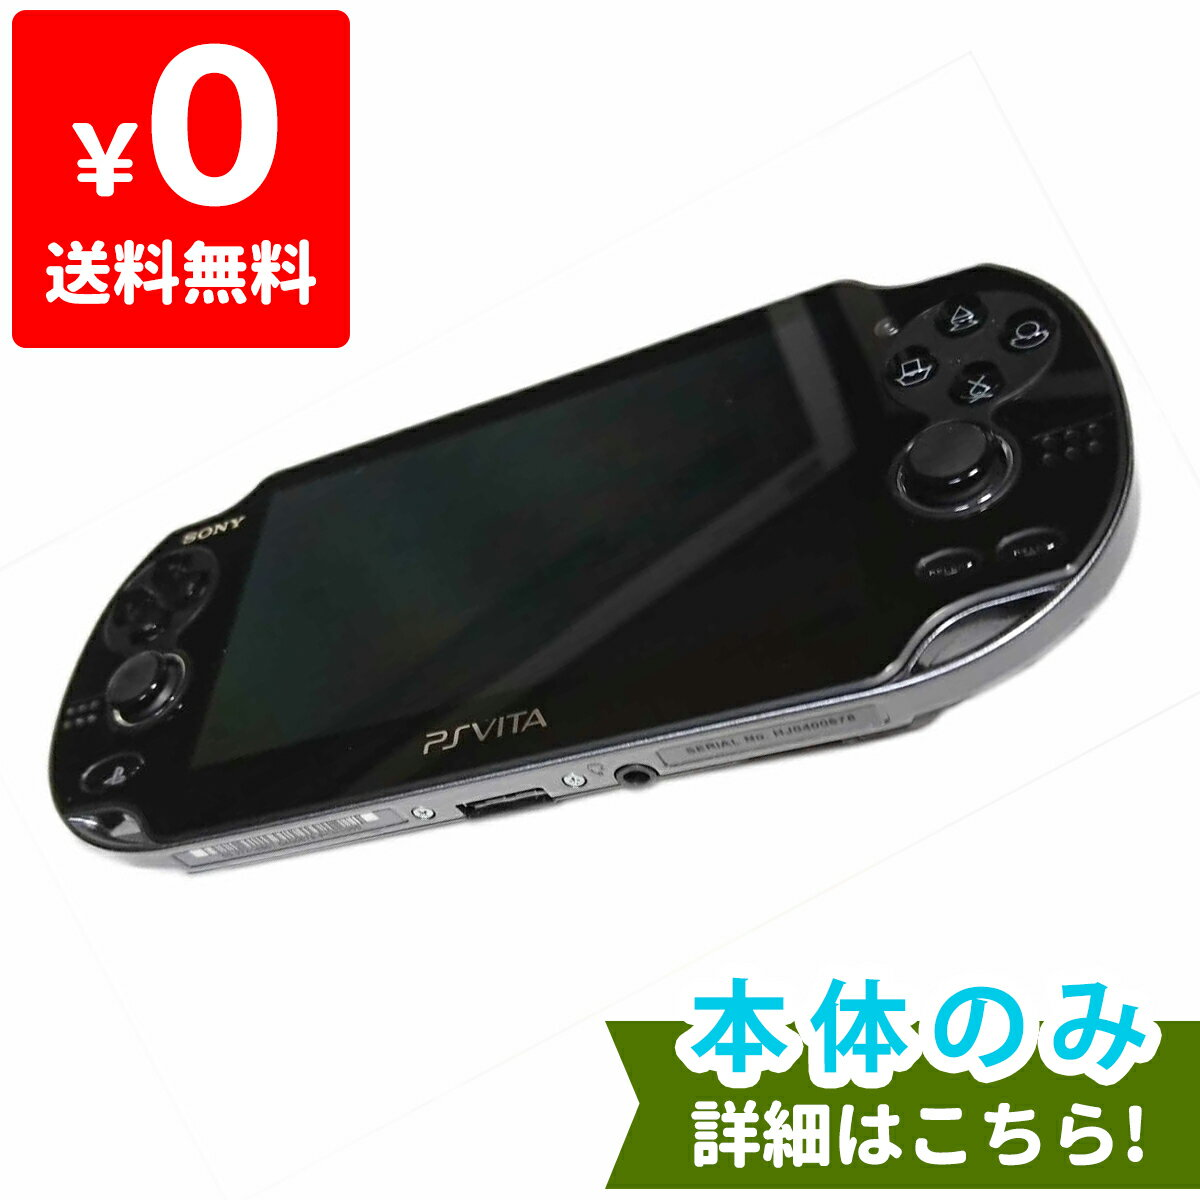 PSVita PlayStation Vita Wi‐Fiモデル クリスタル・ブラック (PCH-1000 ZA01) 本体のみ PlayStationVita SONY ソニー 中古 4948872412841 送料無料 【中古】